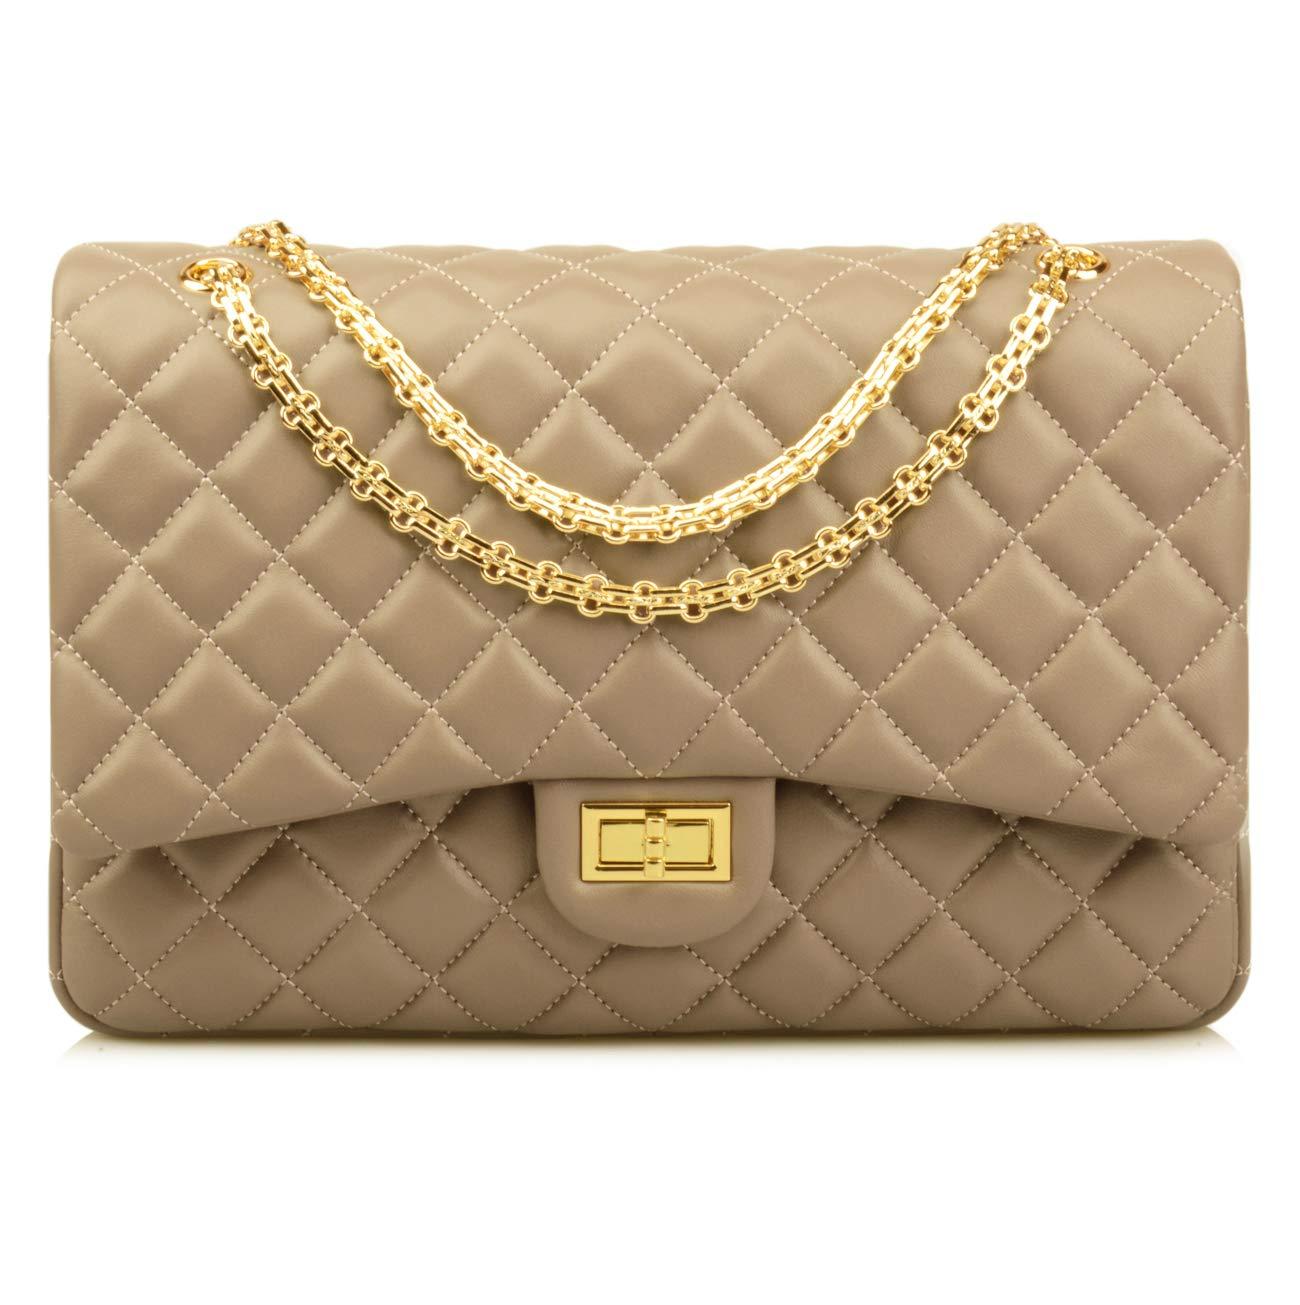 Ainifeel Women's Quilted Oversize Genuine Leather Shoulder Handbag Hobo Bag Purse (X-Large, Taupe (gold hardware))